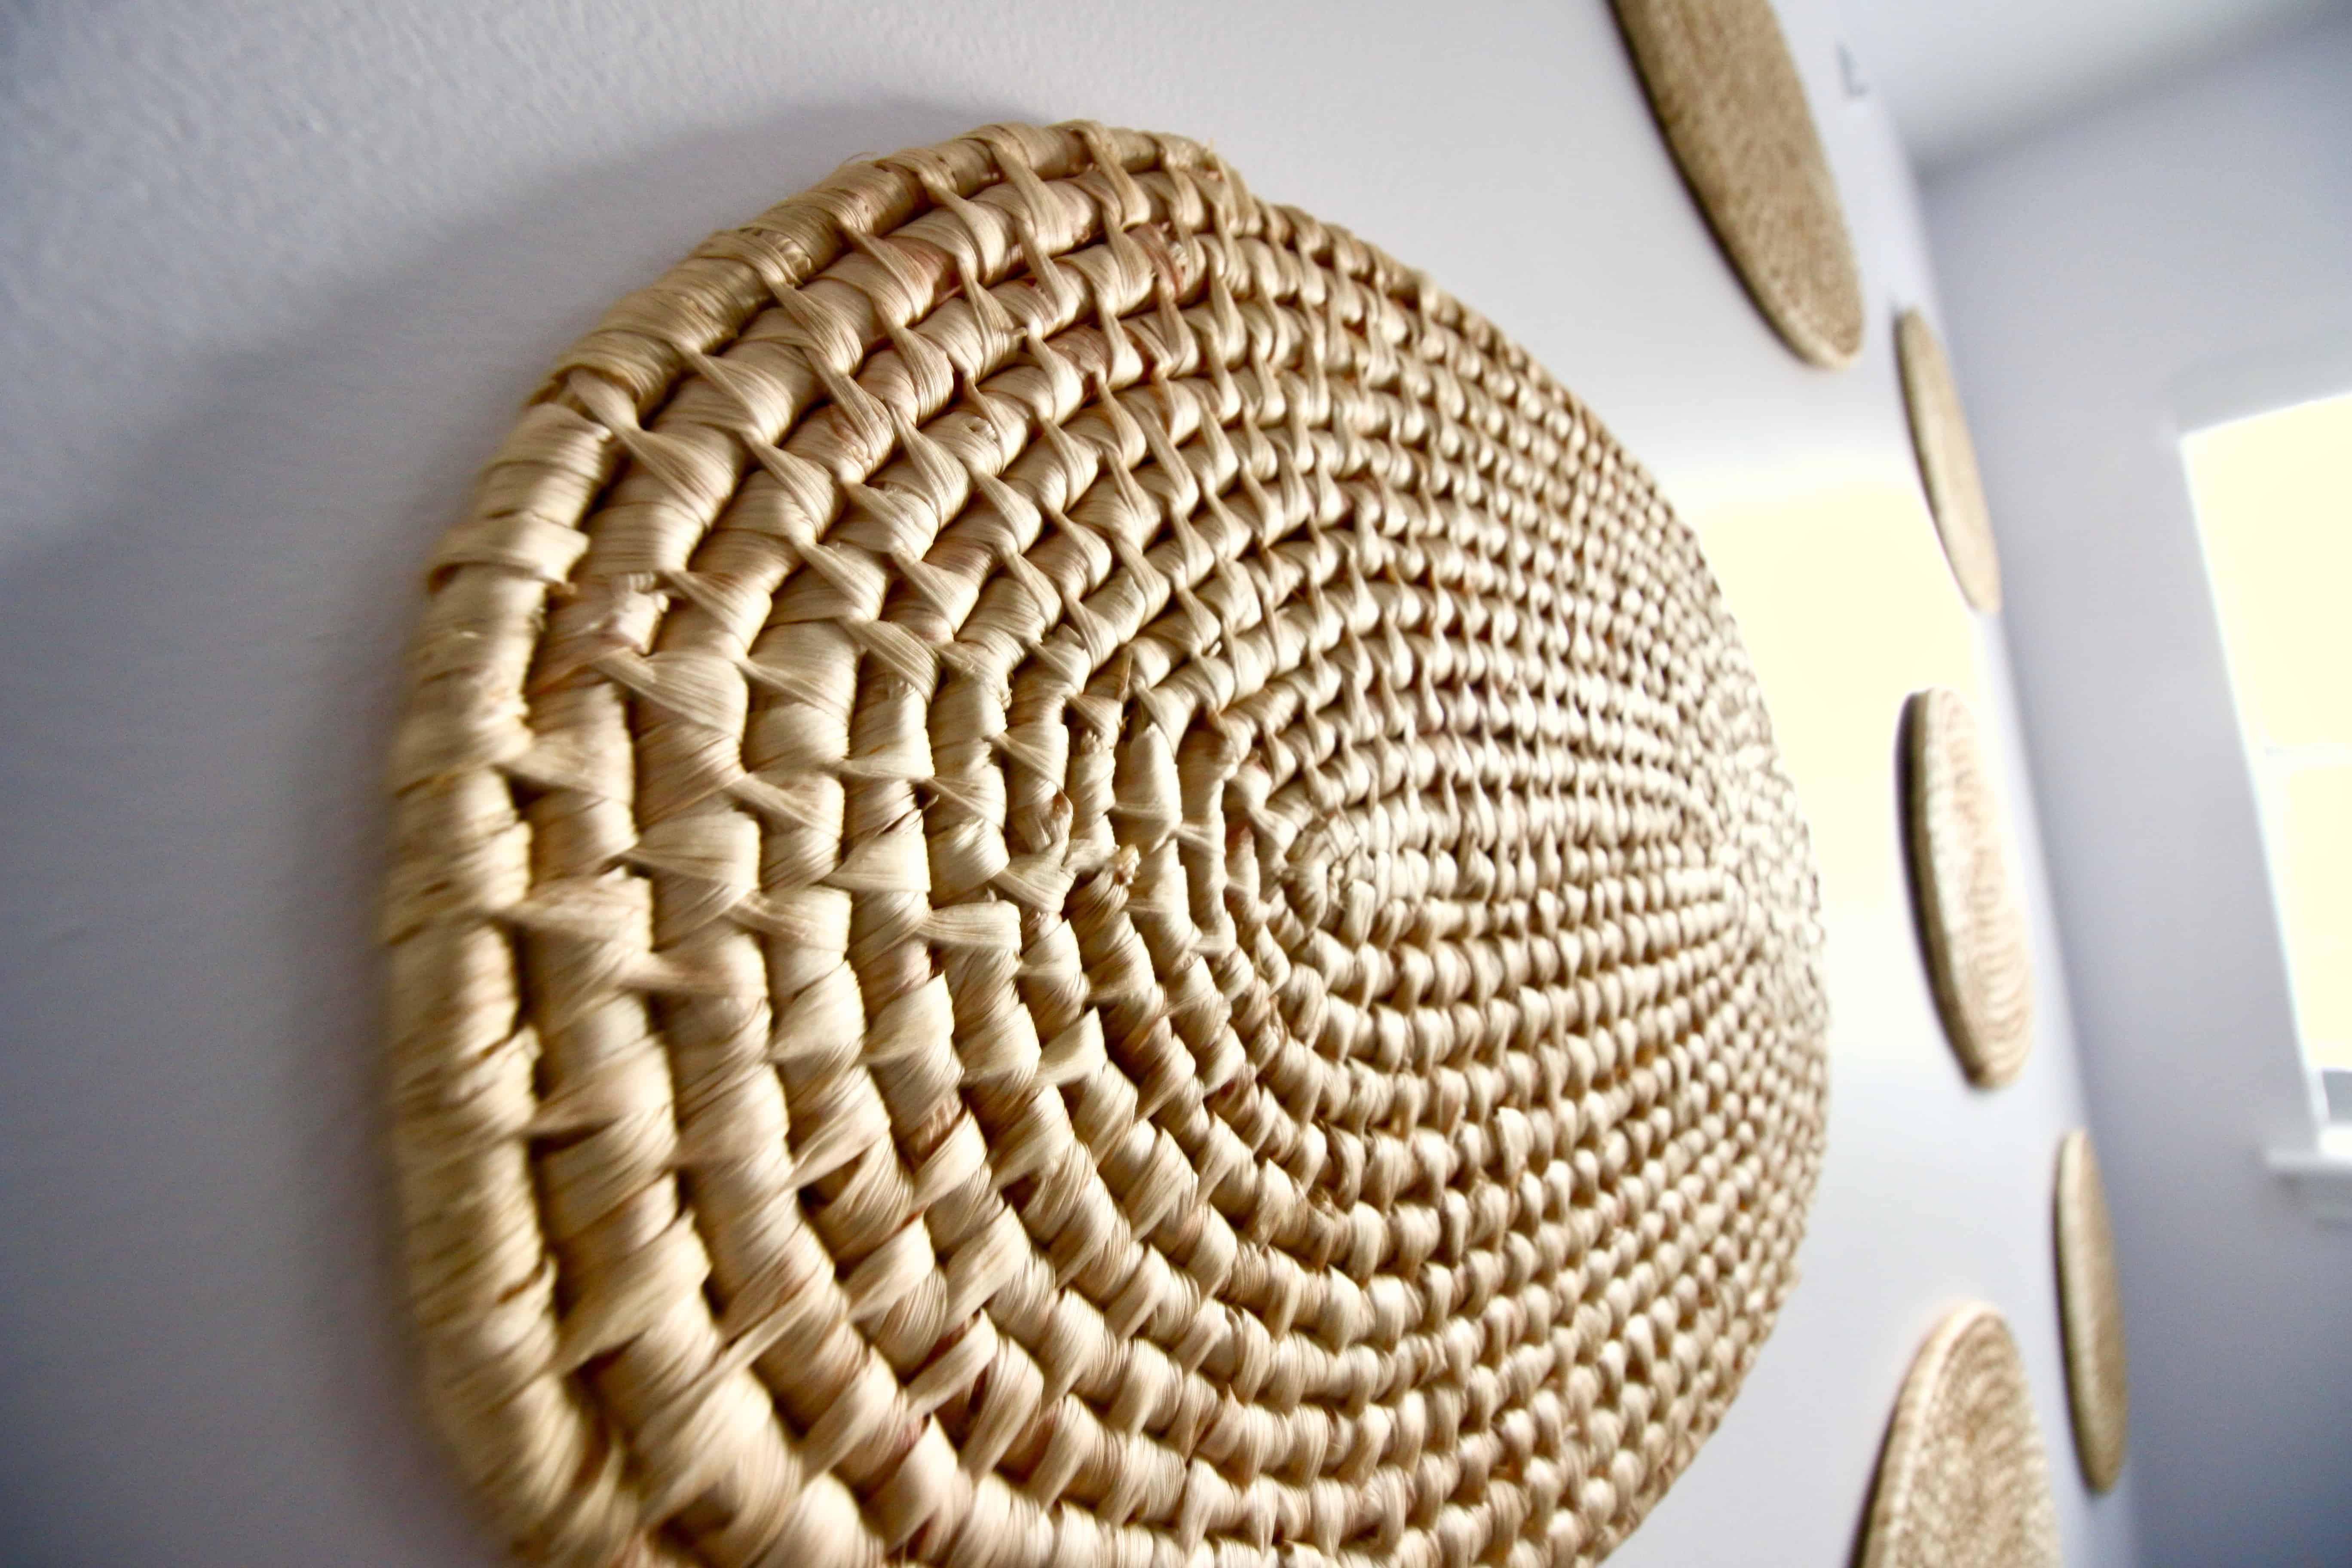 DIY Woven Wall Hanging Display via Charleston Crafted